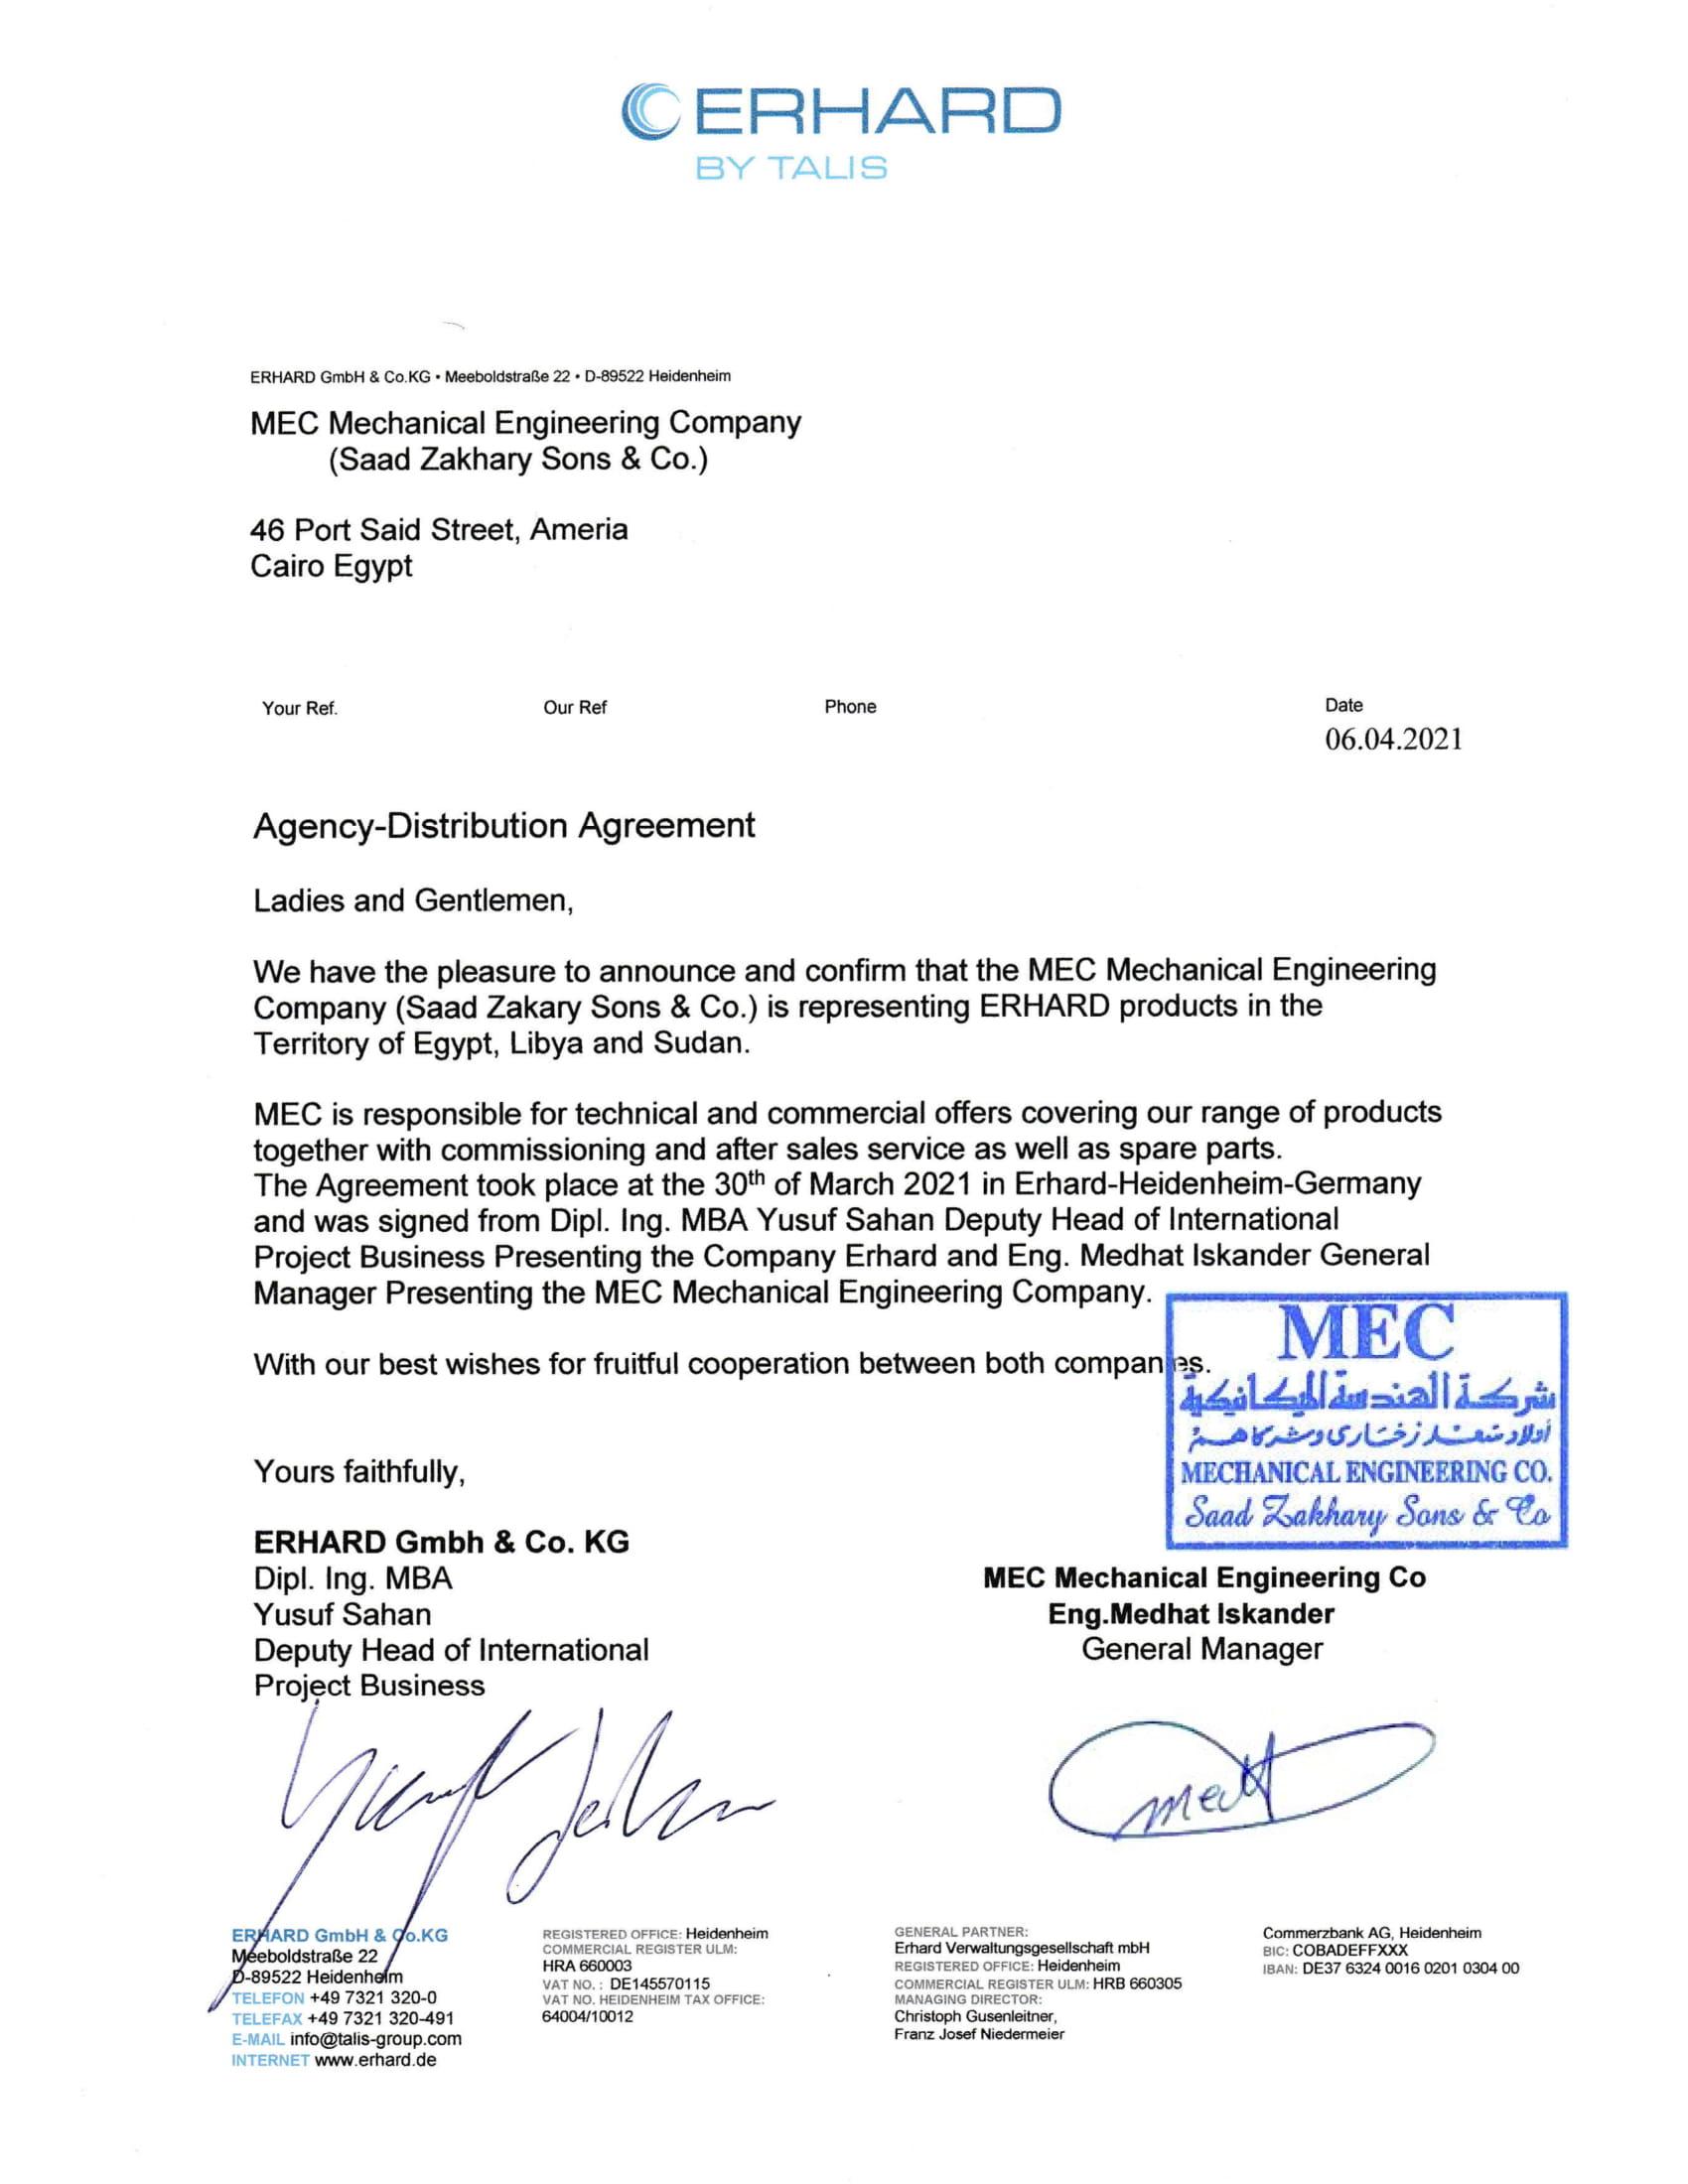 Agency Distribution Agreement ERHARD_MEC_April 2021-1